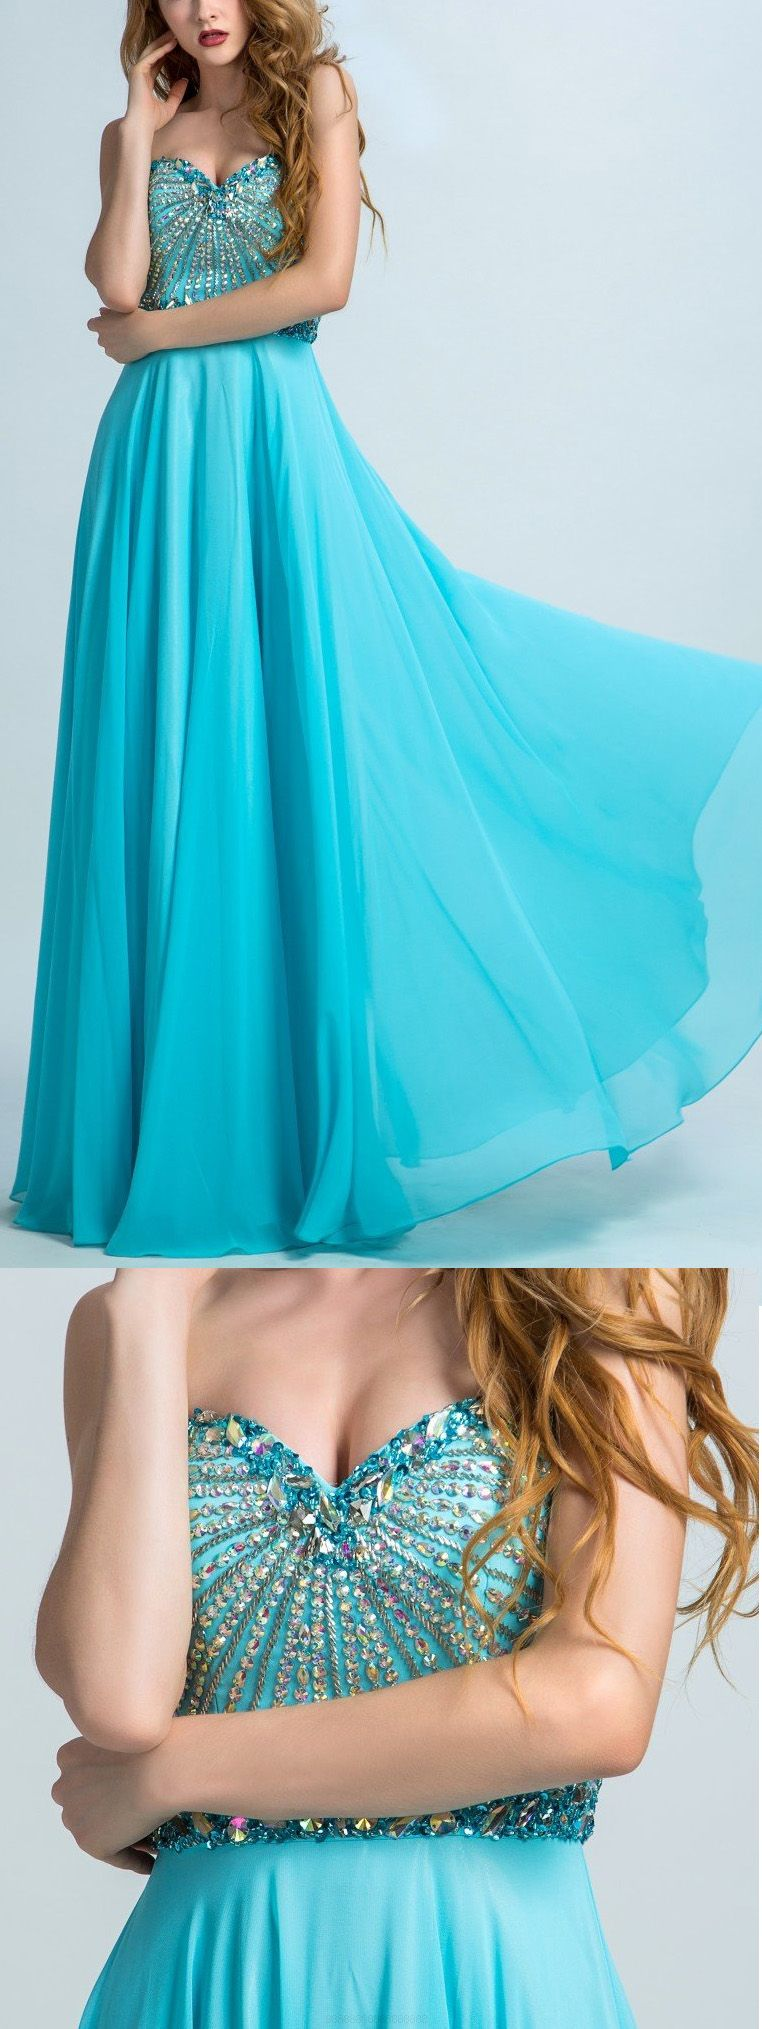 Sweetheart evening dresses light blue long prom dresses beautiful